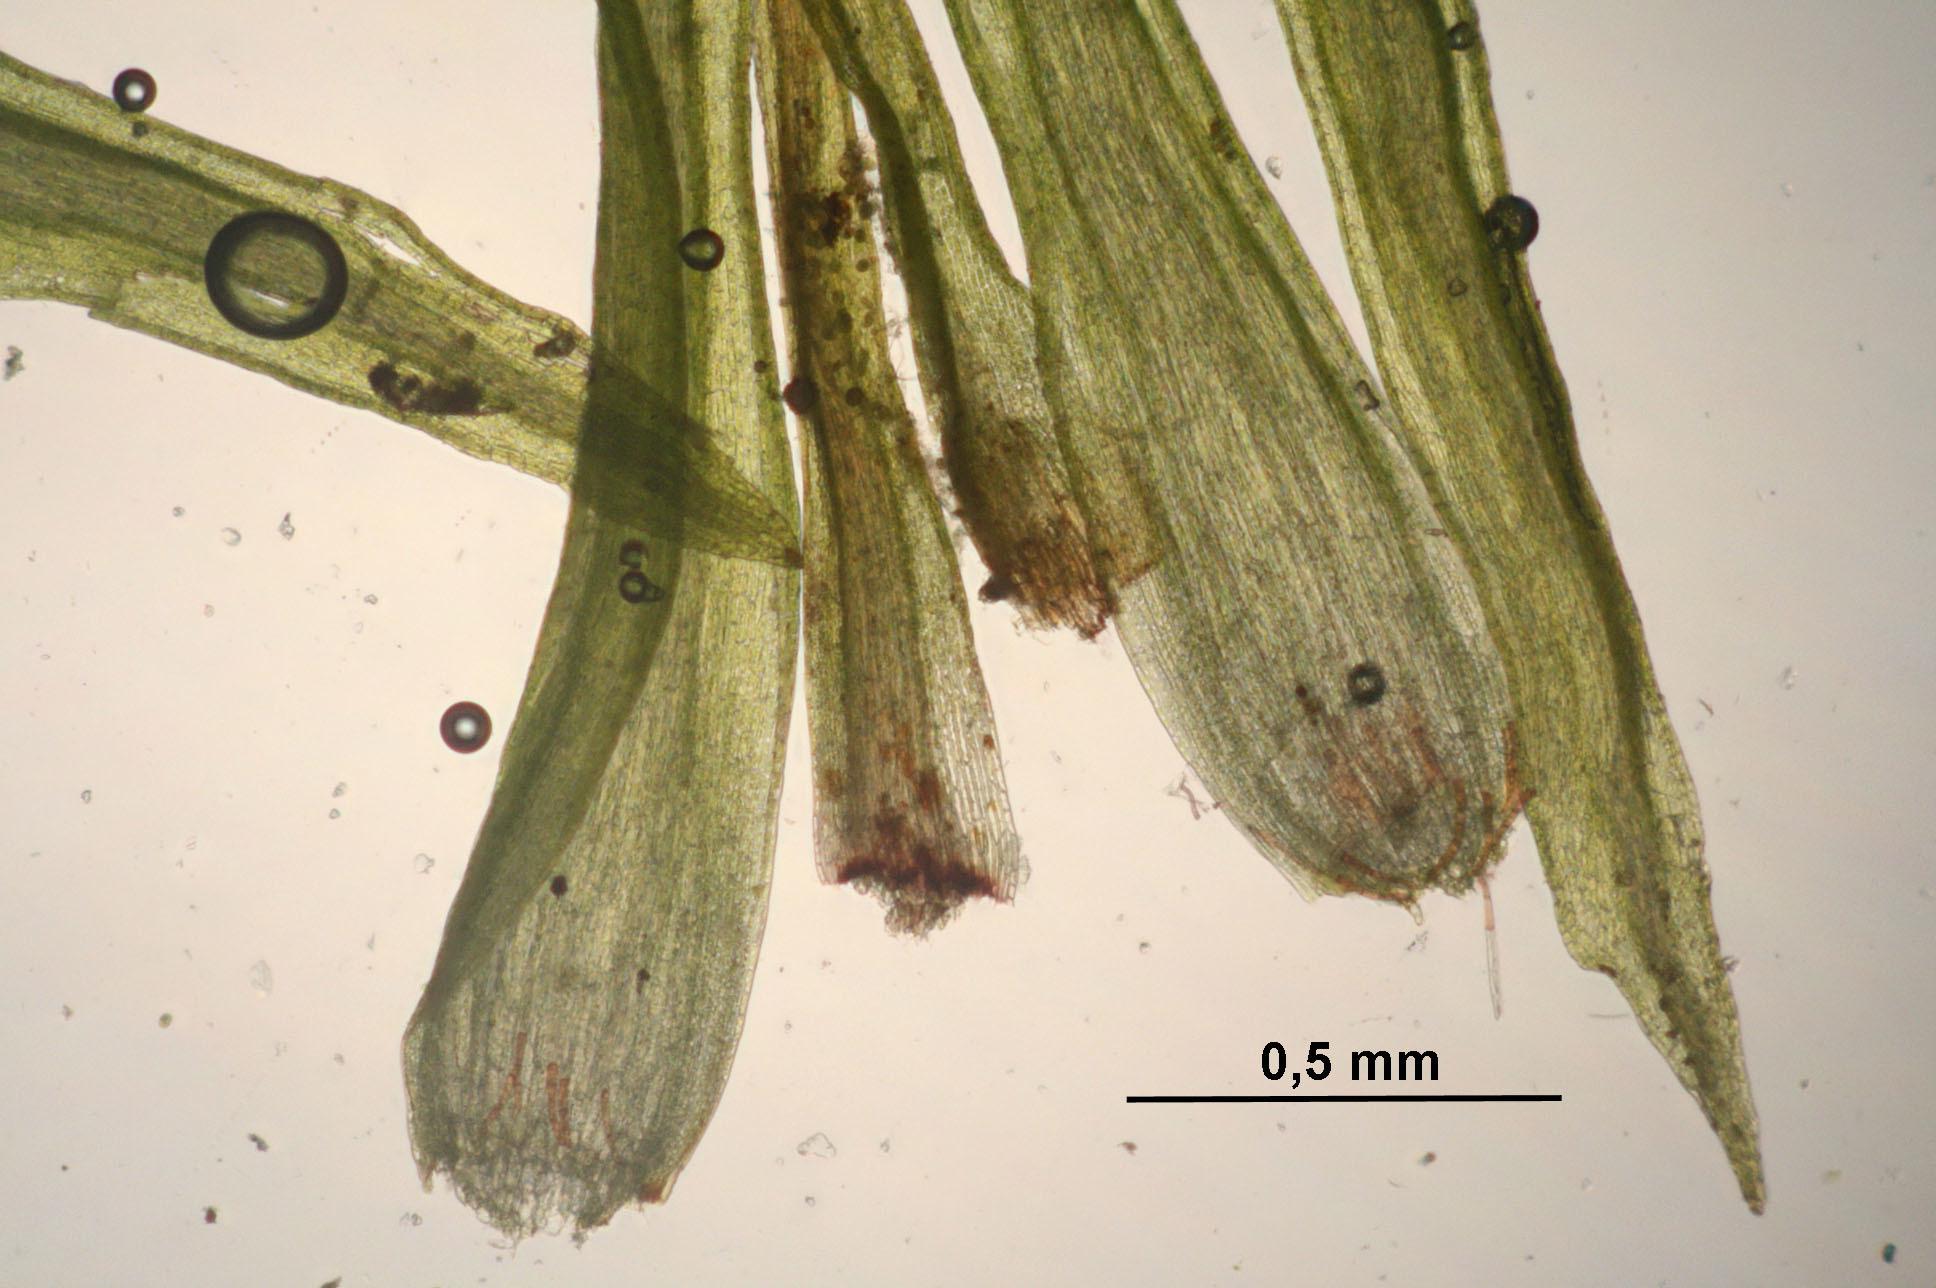 Image of meesia moss